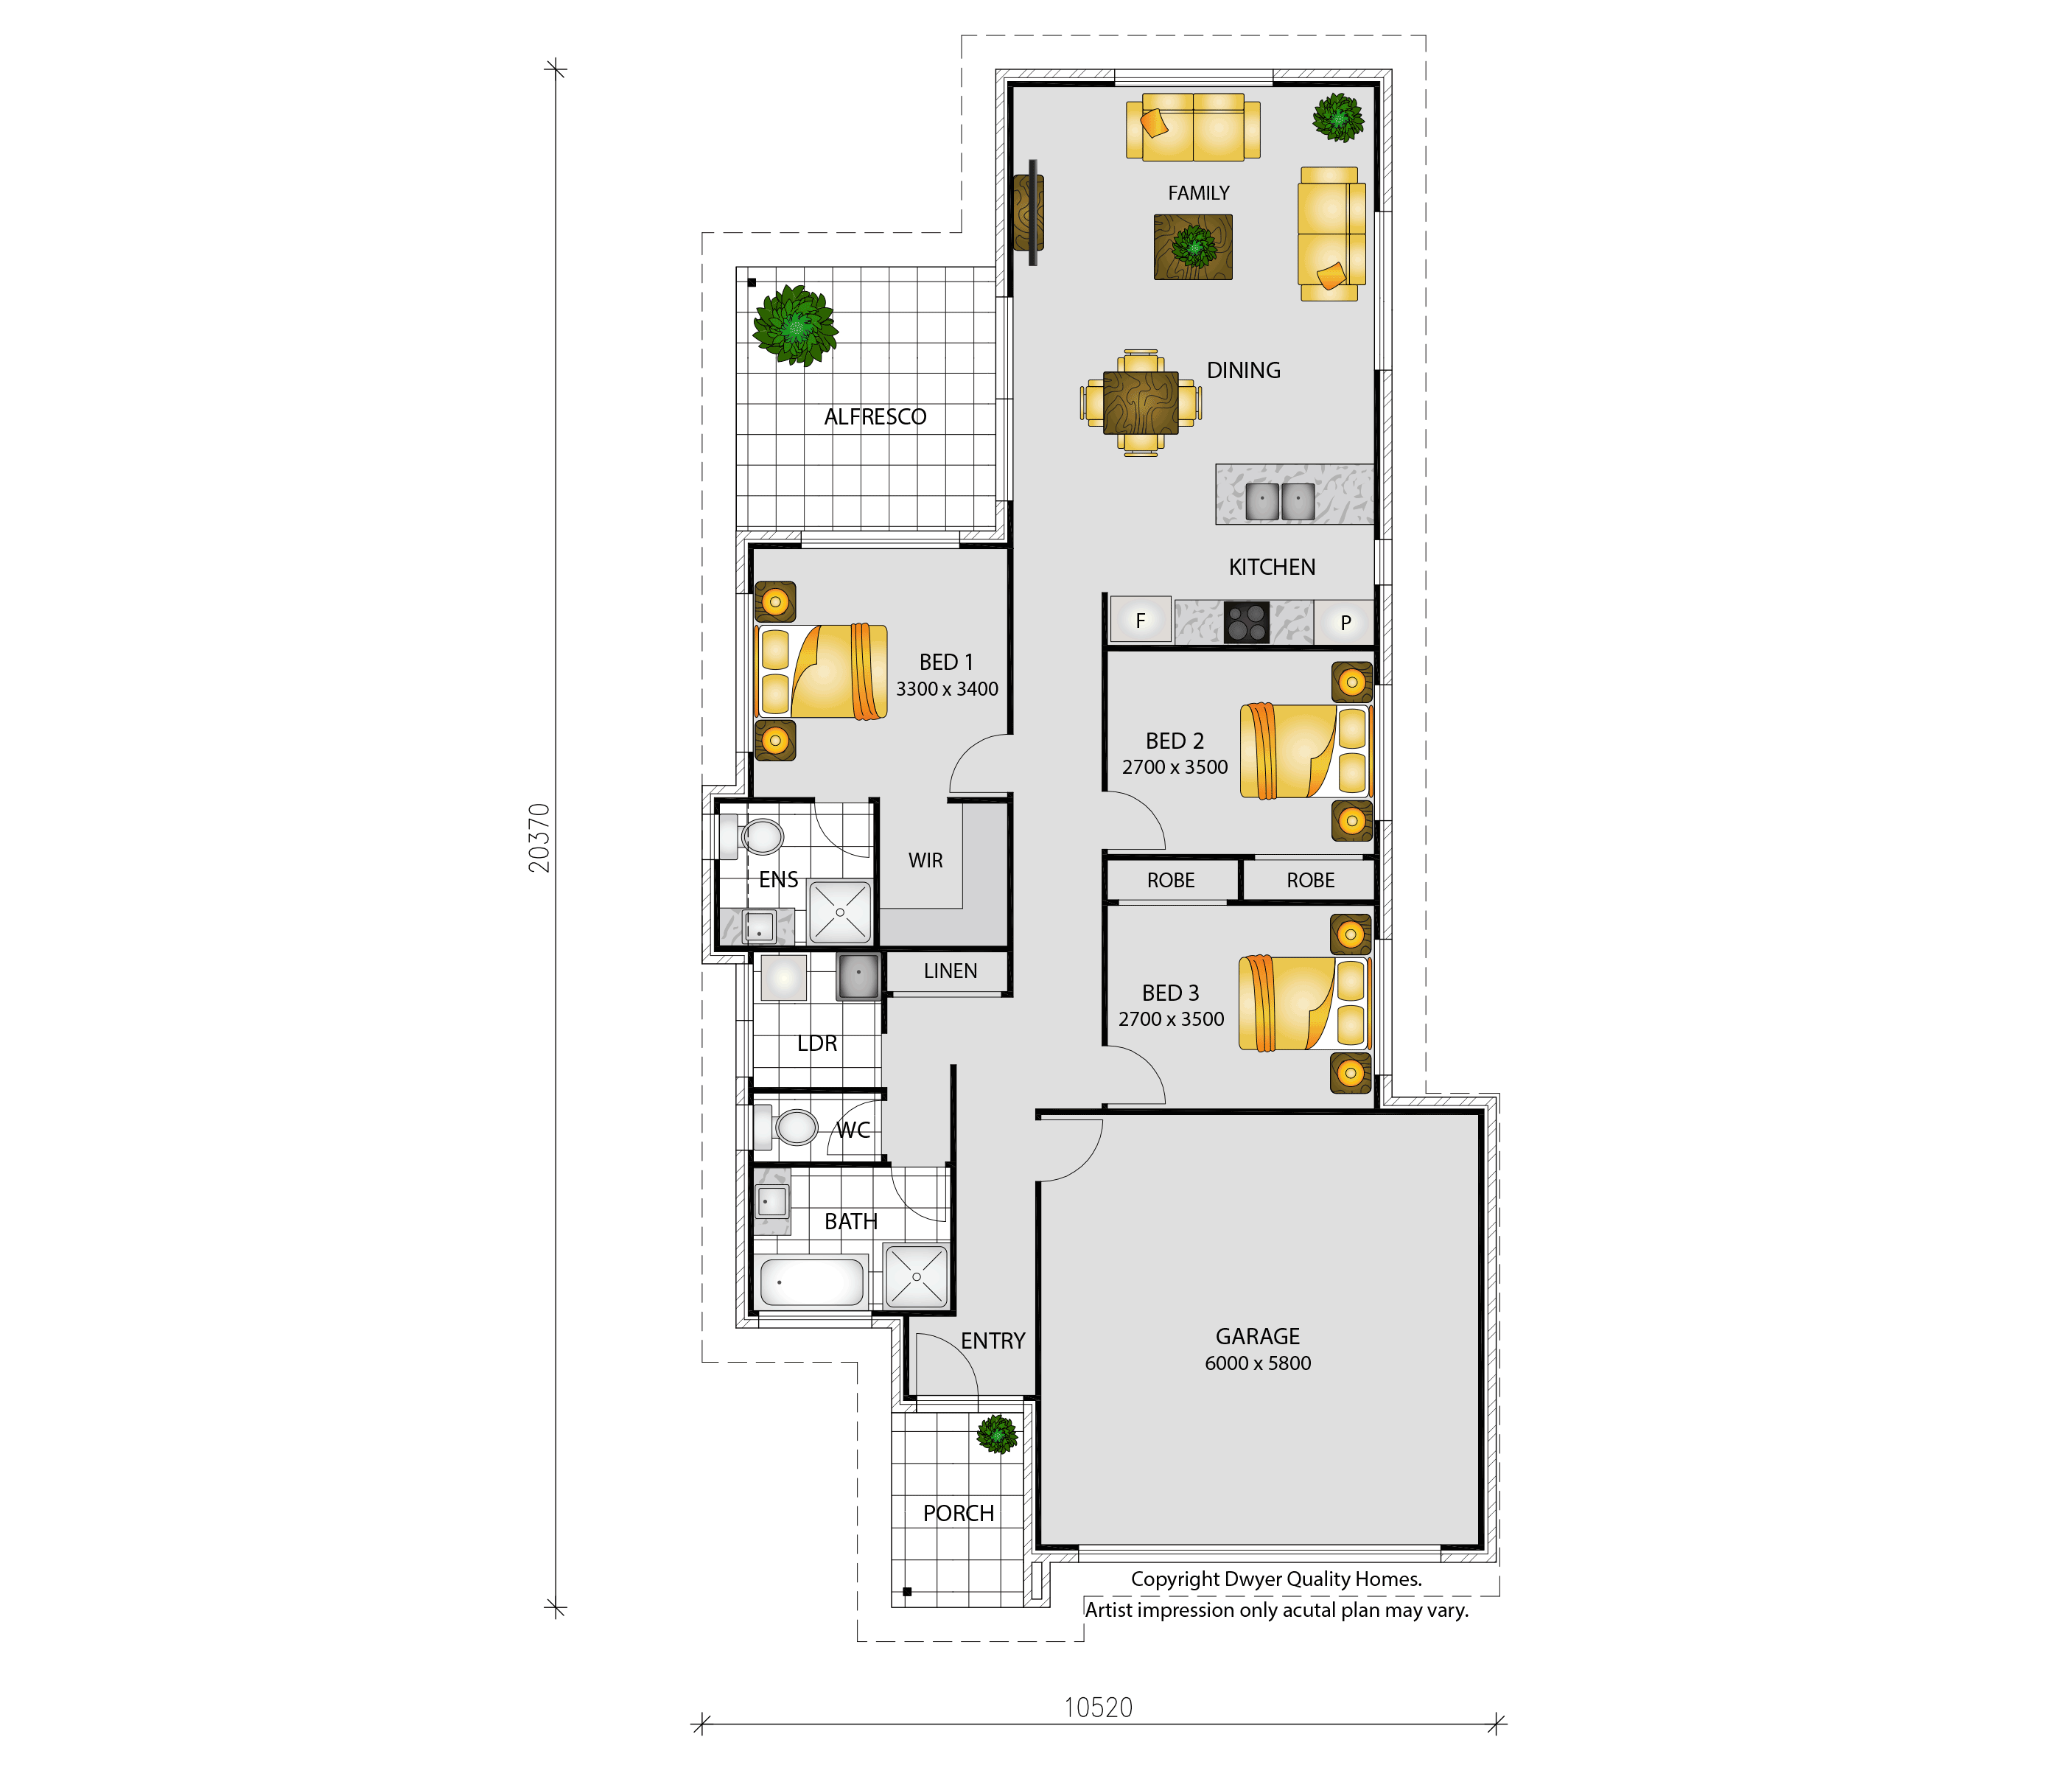 Dwyer Quality Homes - Sienna 167